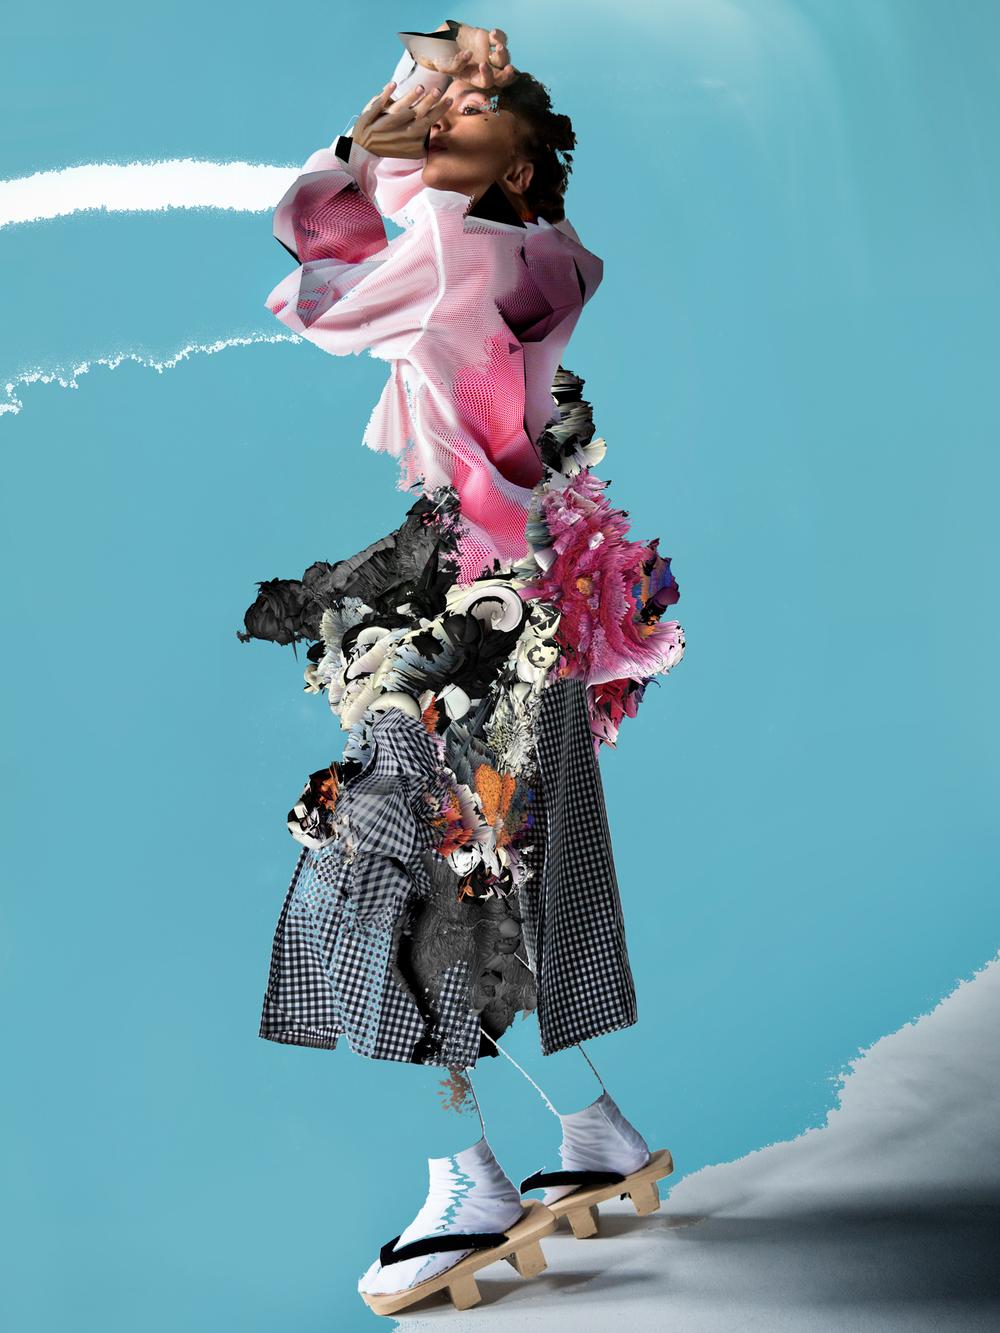 Mesh sweatshirt by PLASTIC TOKYO, Zip-up sweatshirt by ADIDAS, Skirt by NICOMEDE TALAVERA